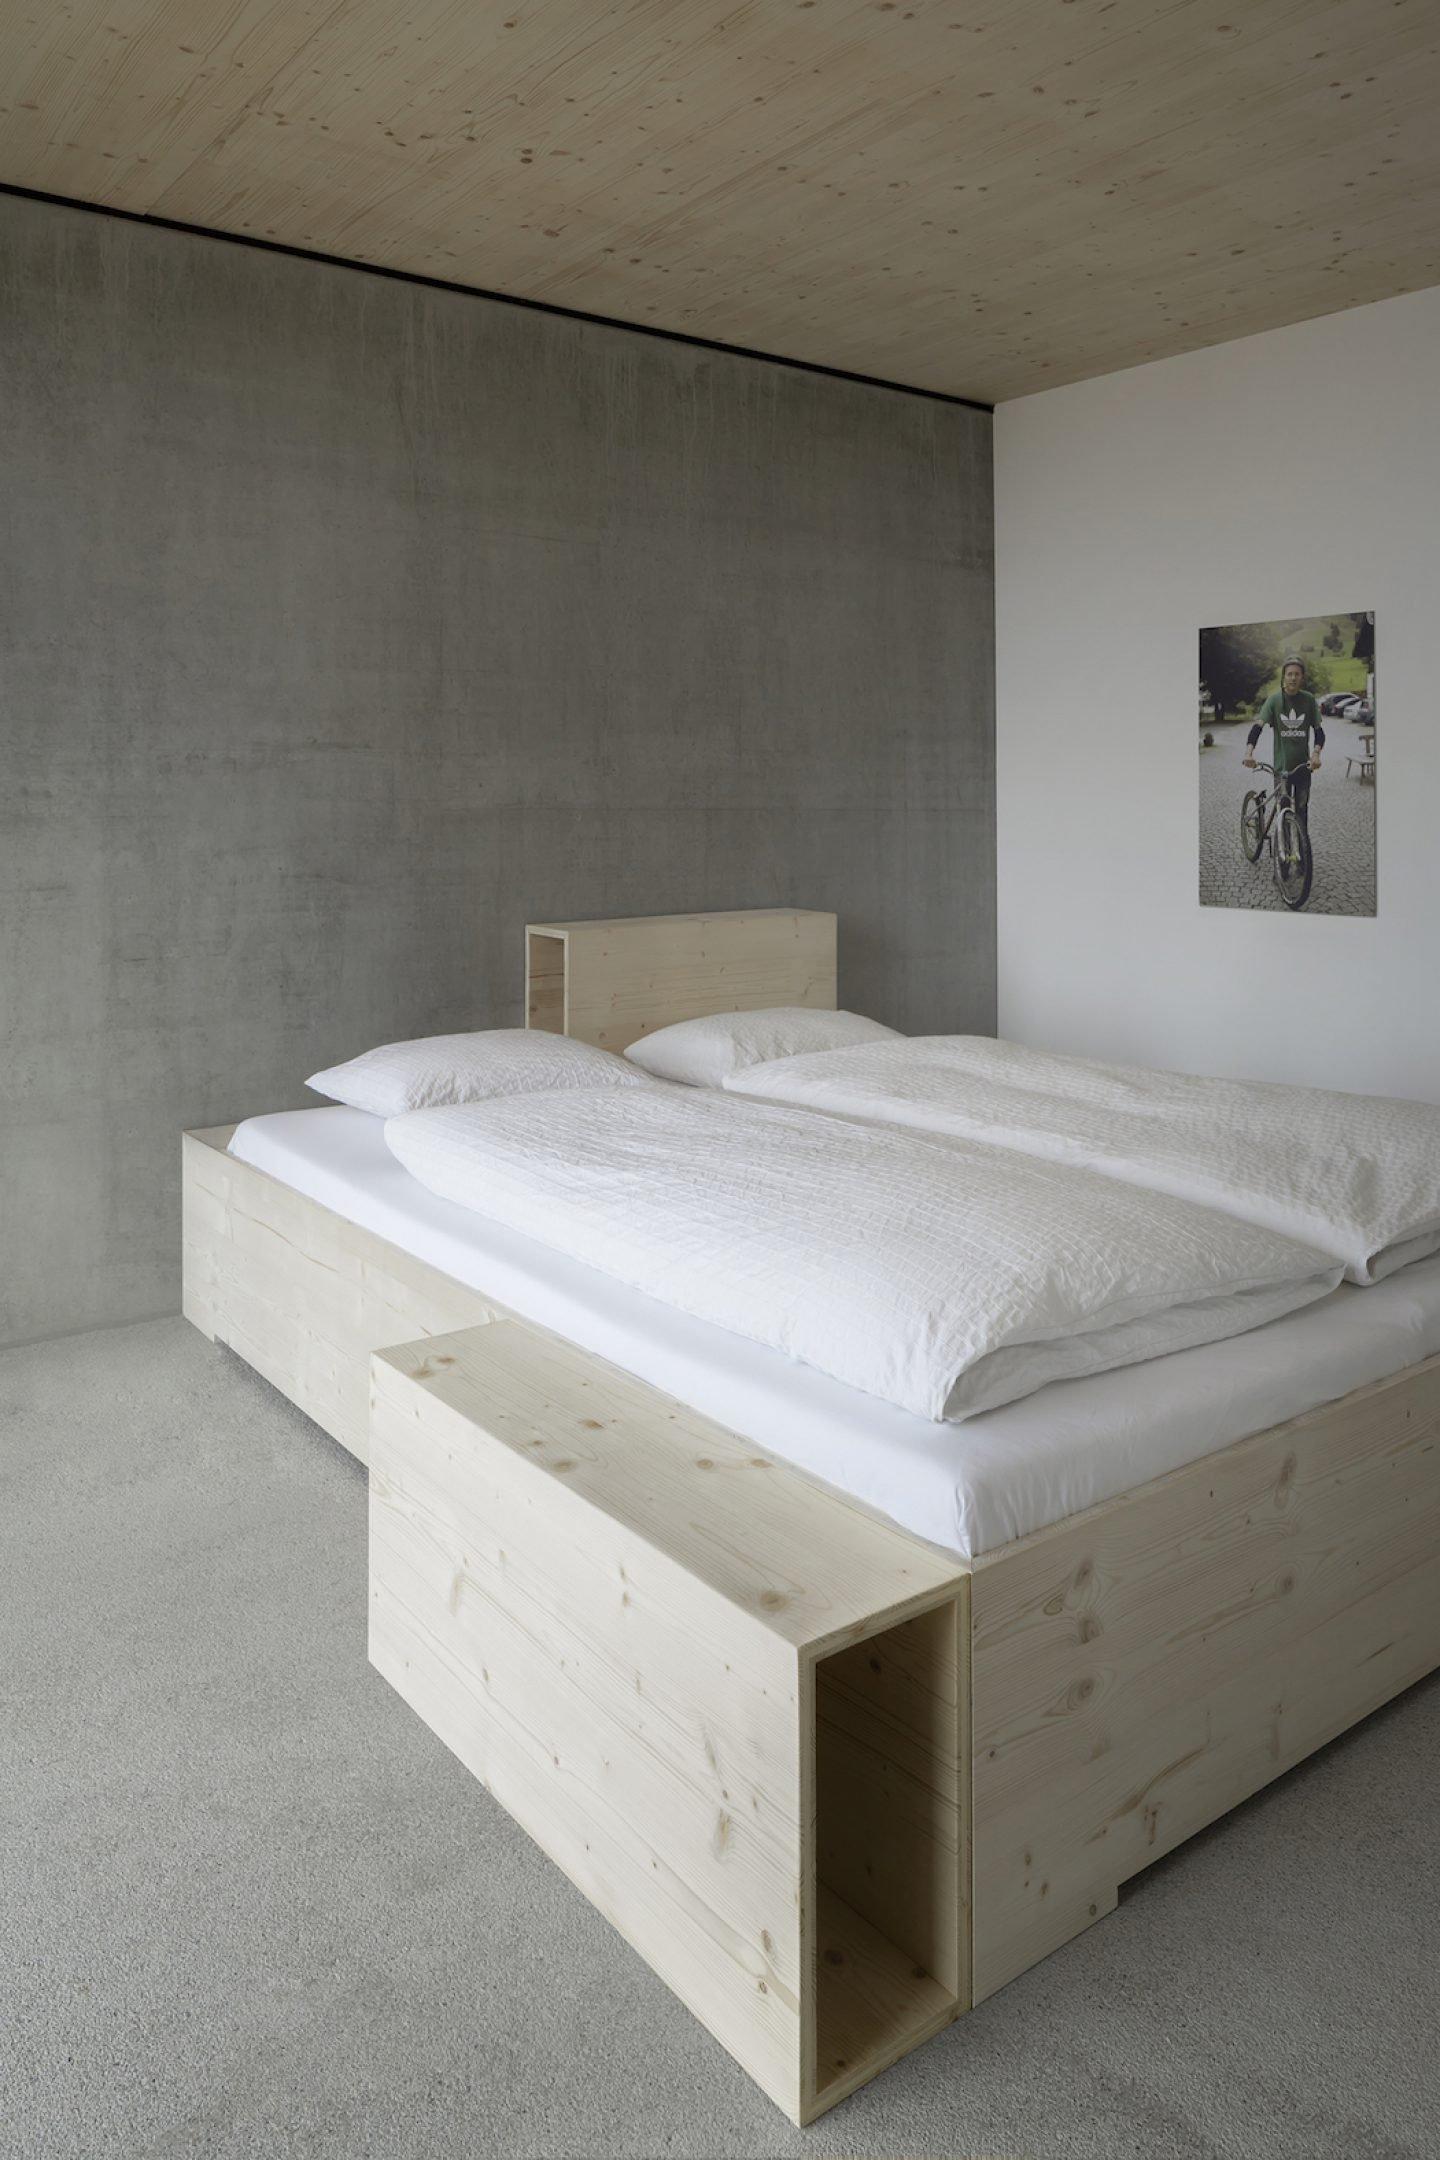 architecture_studioyonder_04